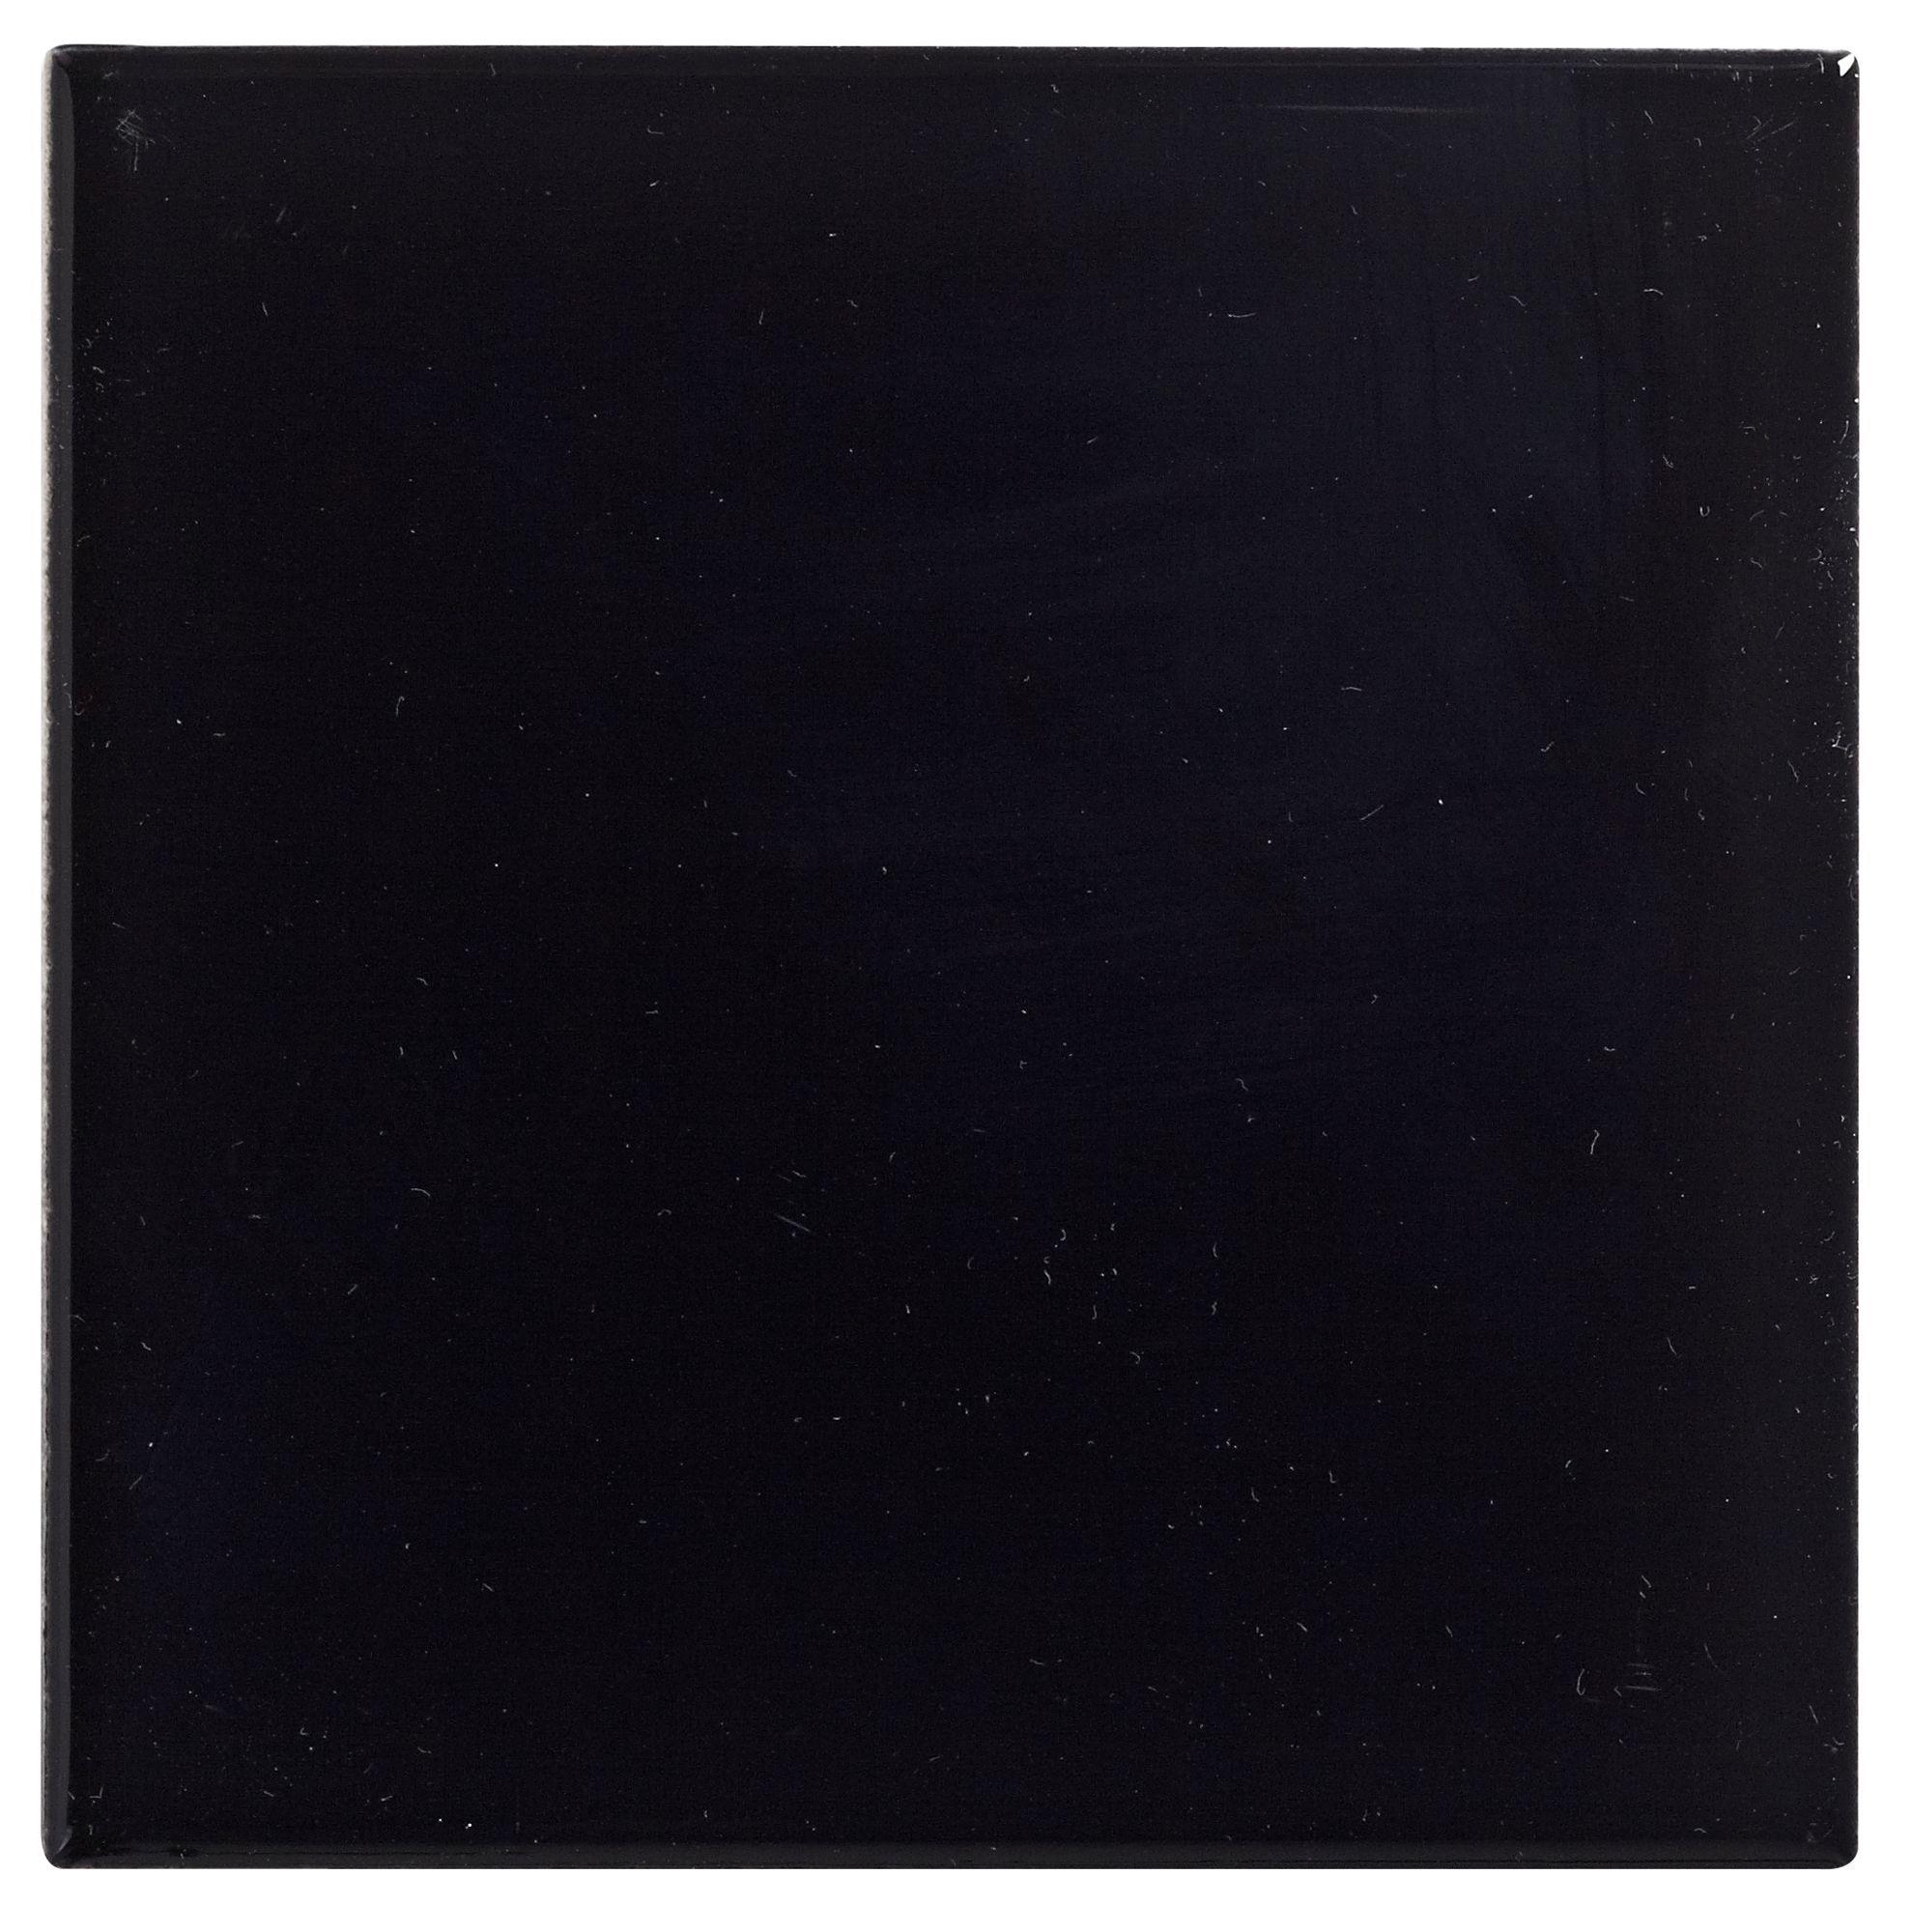 Utopia Black Ceramic Wall Tile, Pack Of 25, (l)100mm (w)100mm